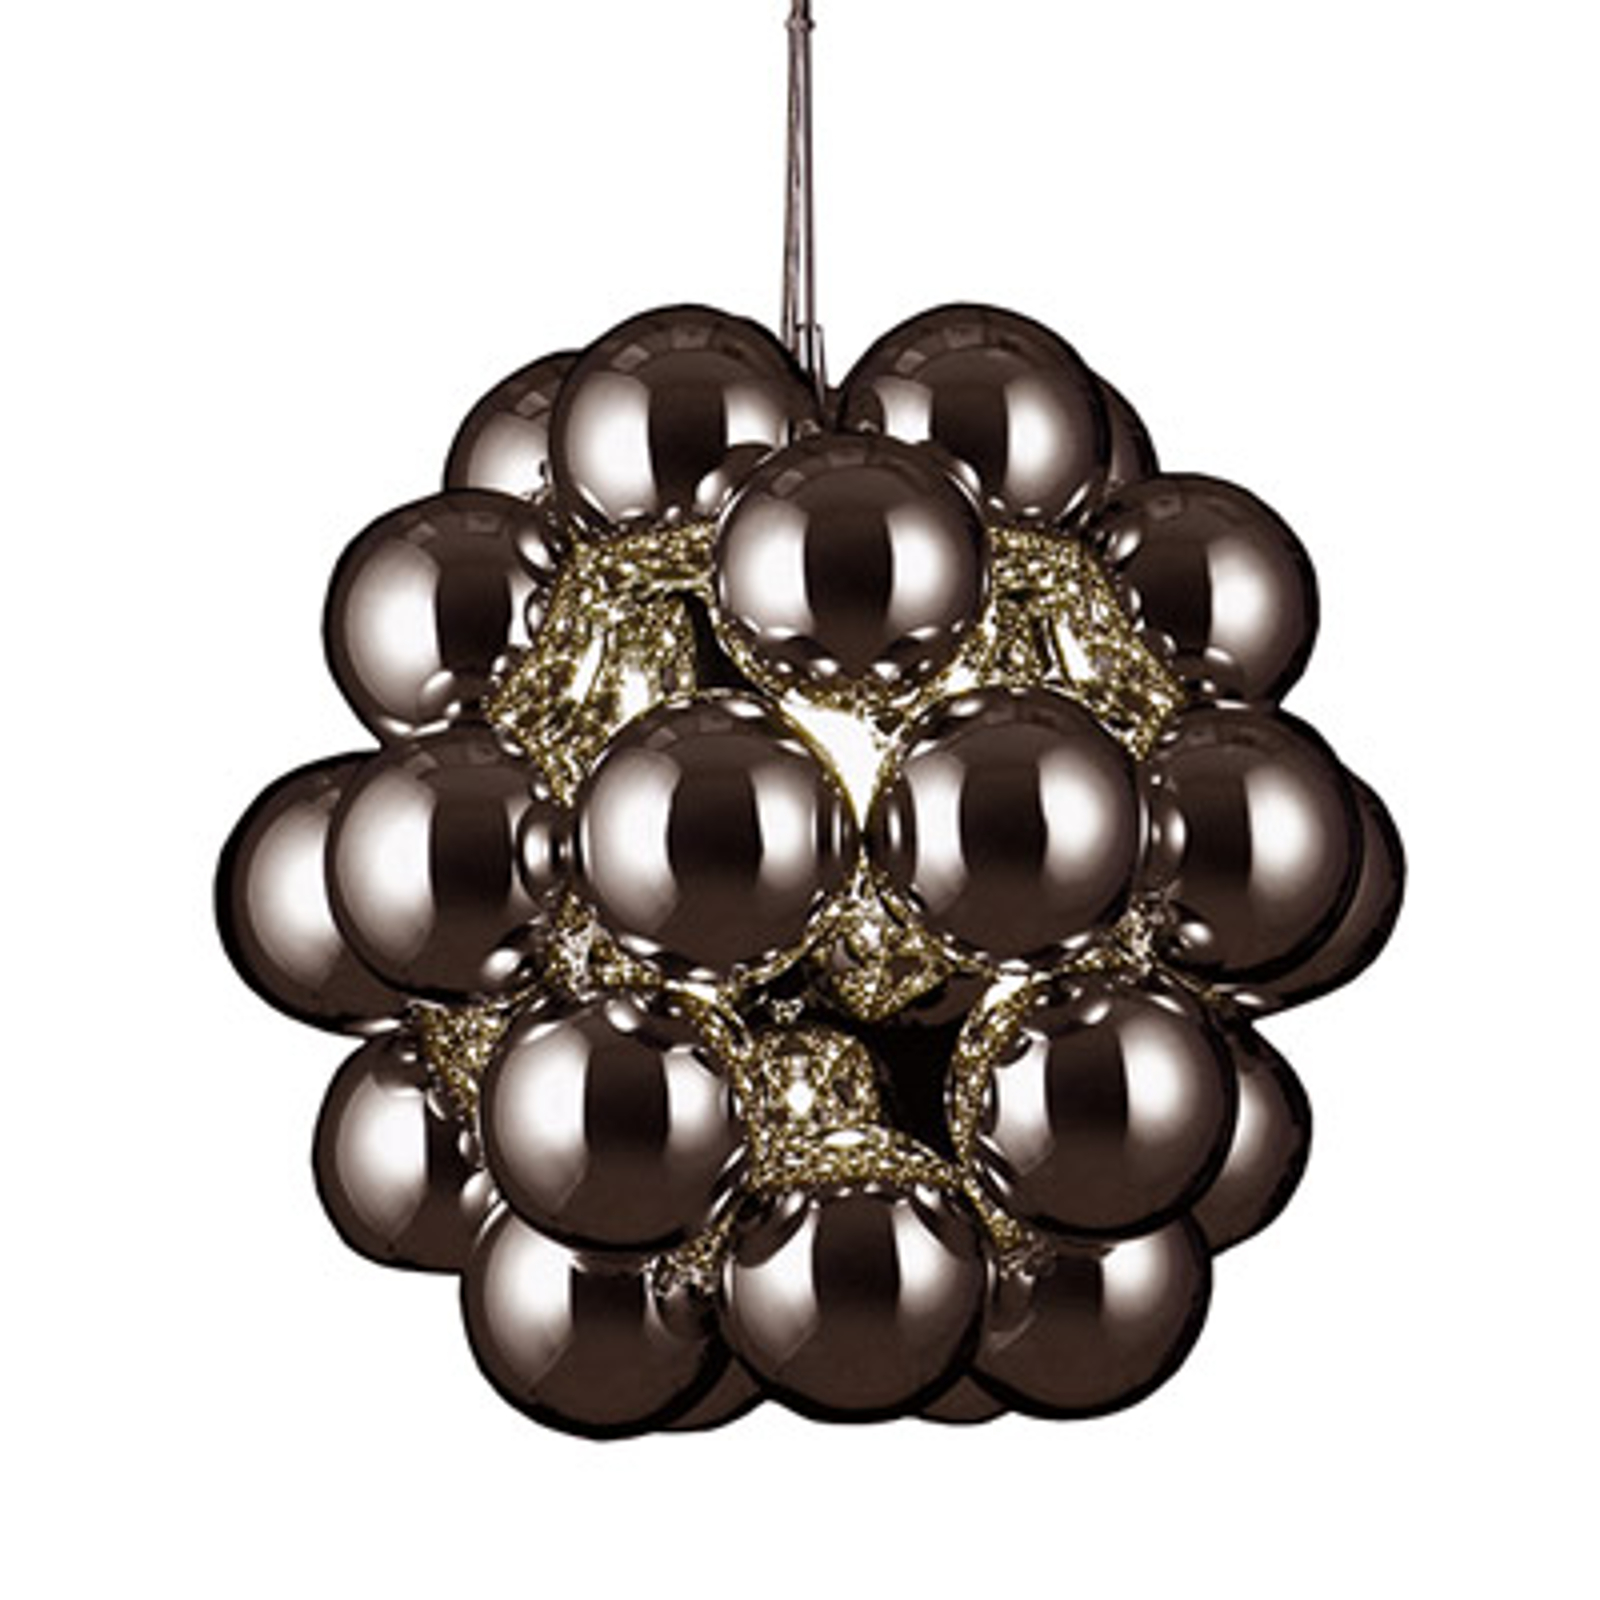 Innermost Beads Penta - Hanglamp in brons